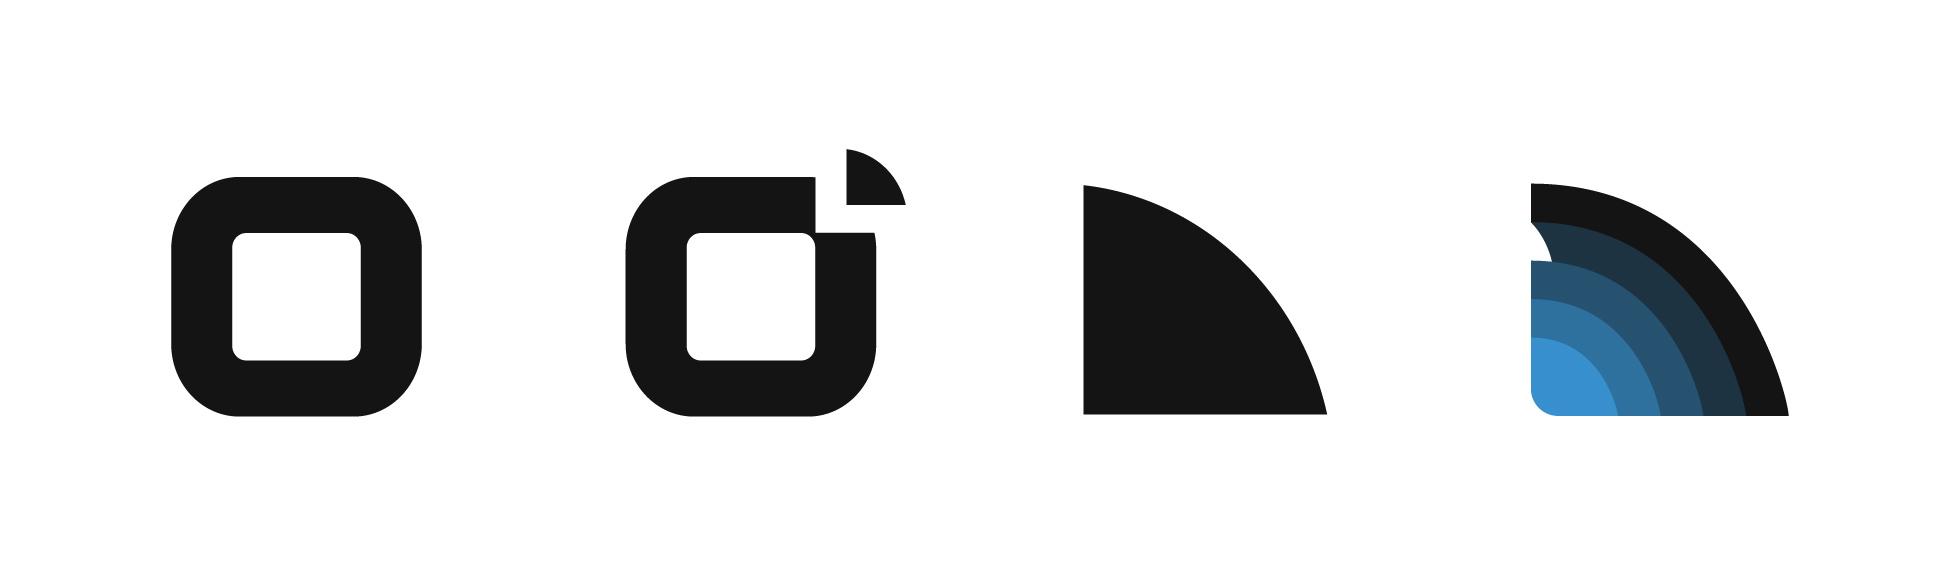 ocearch-logo-build